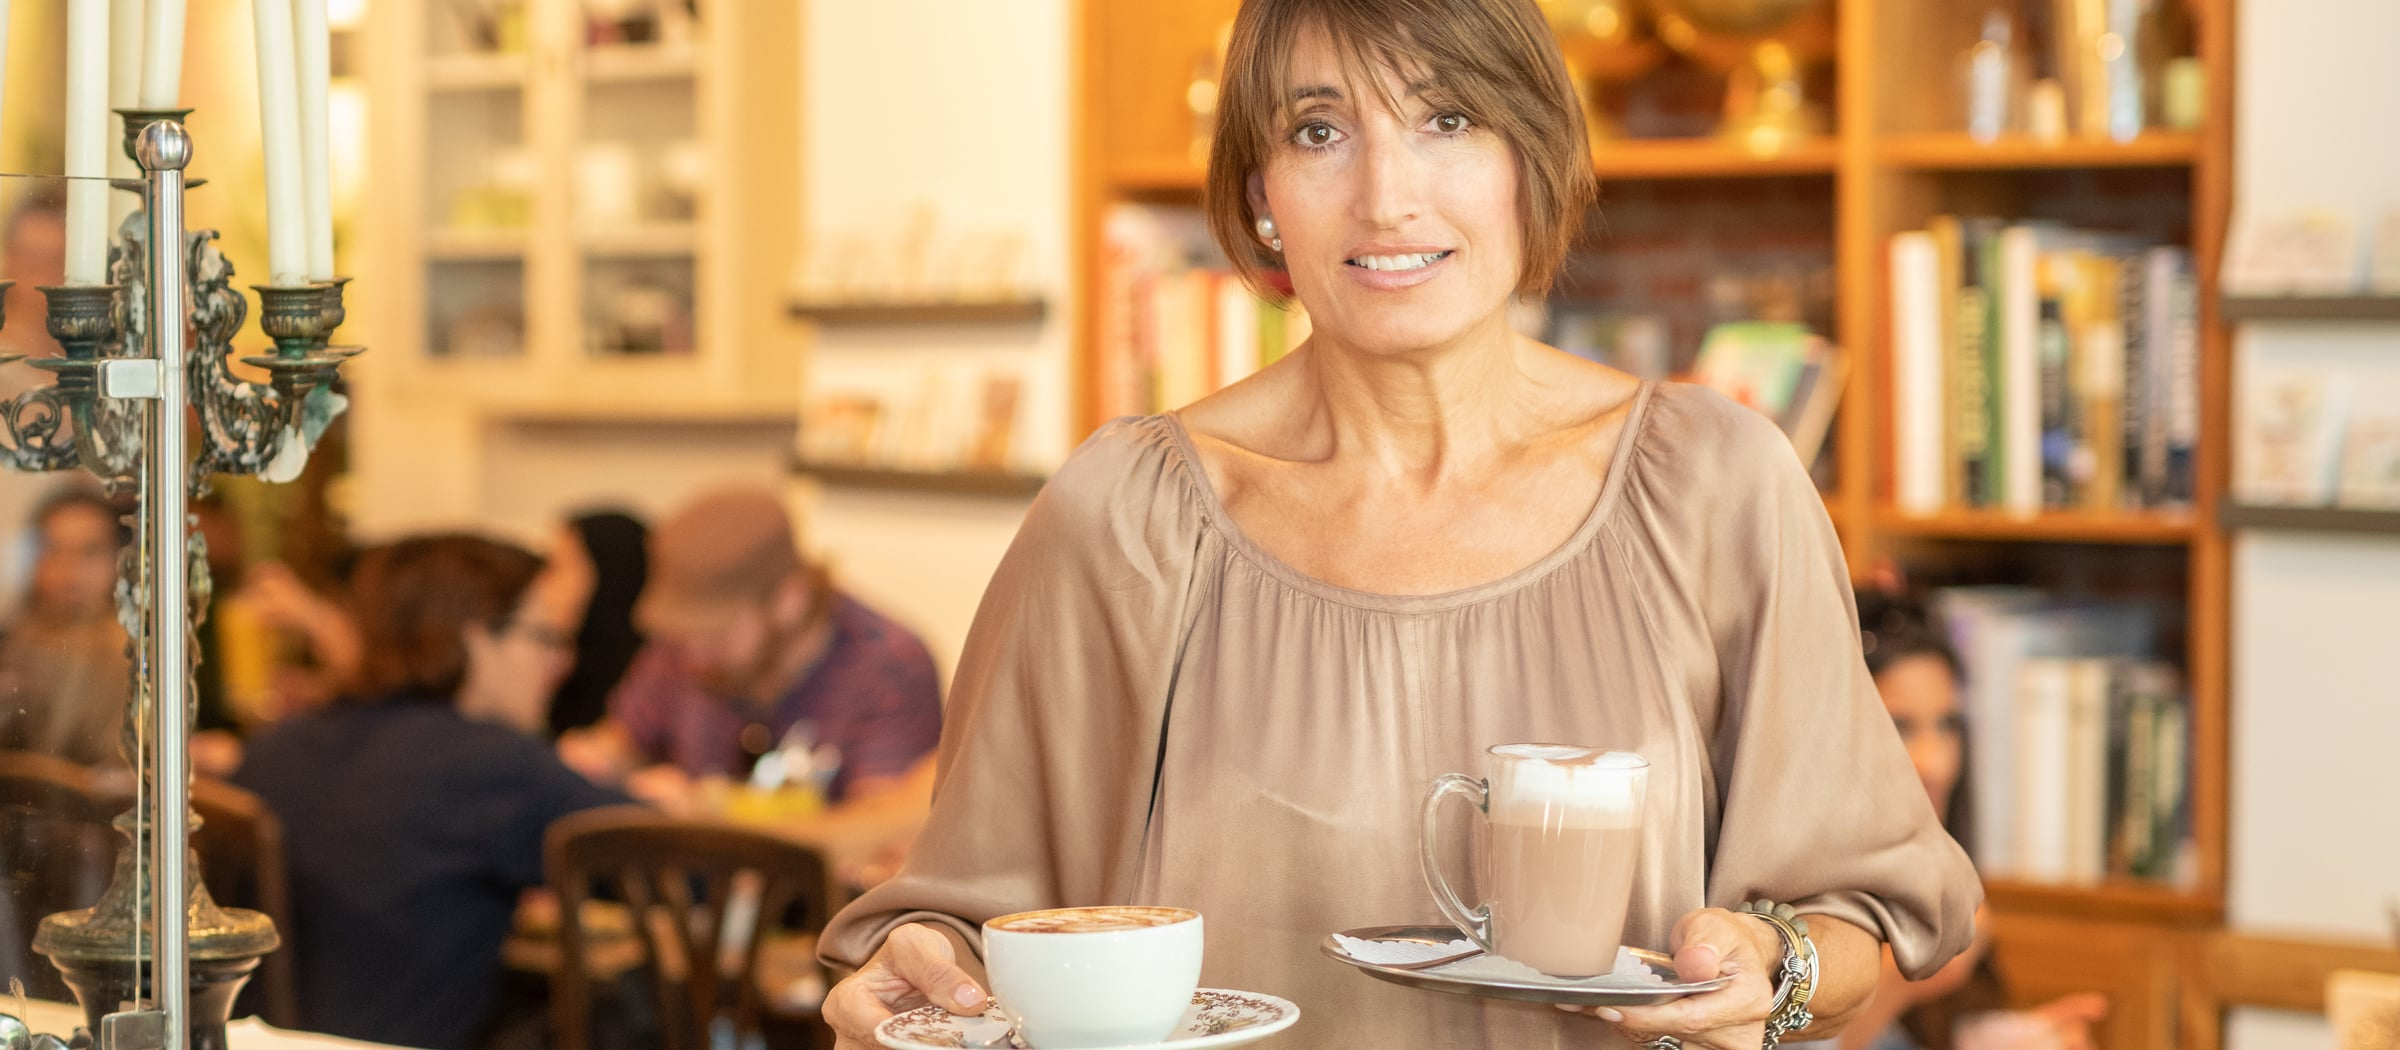 Pistor Inspiration Babus Bakery Coffeehouse Kaffee Sandra Kubista